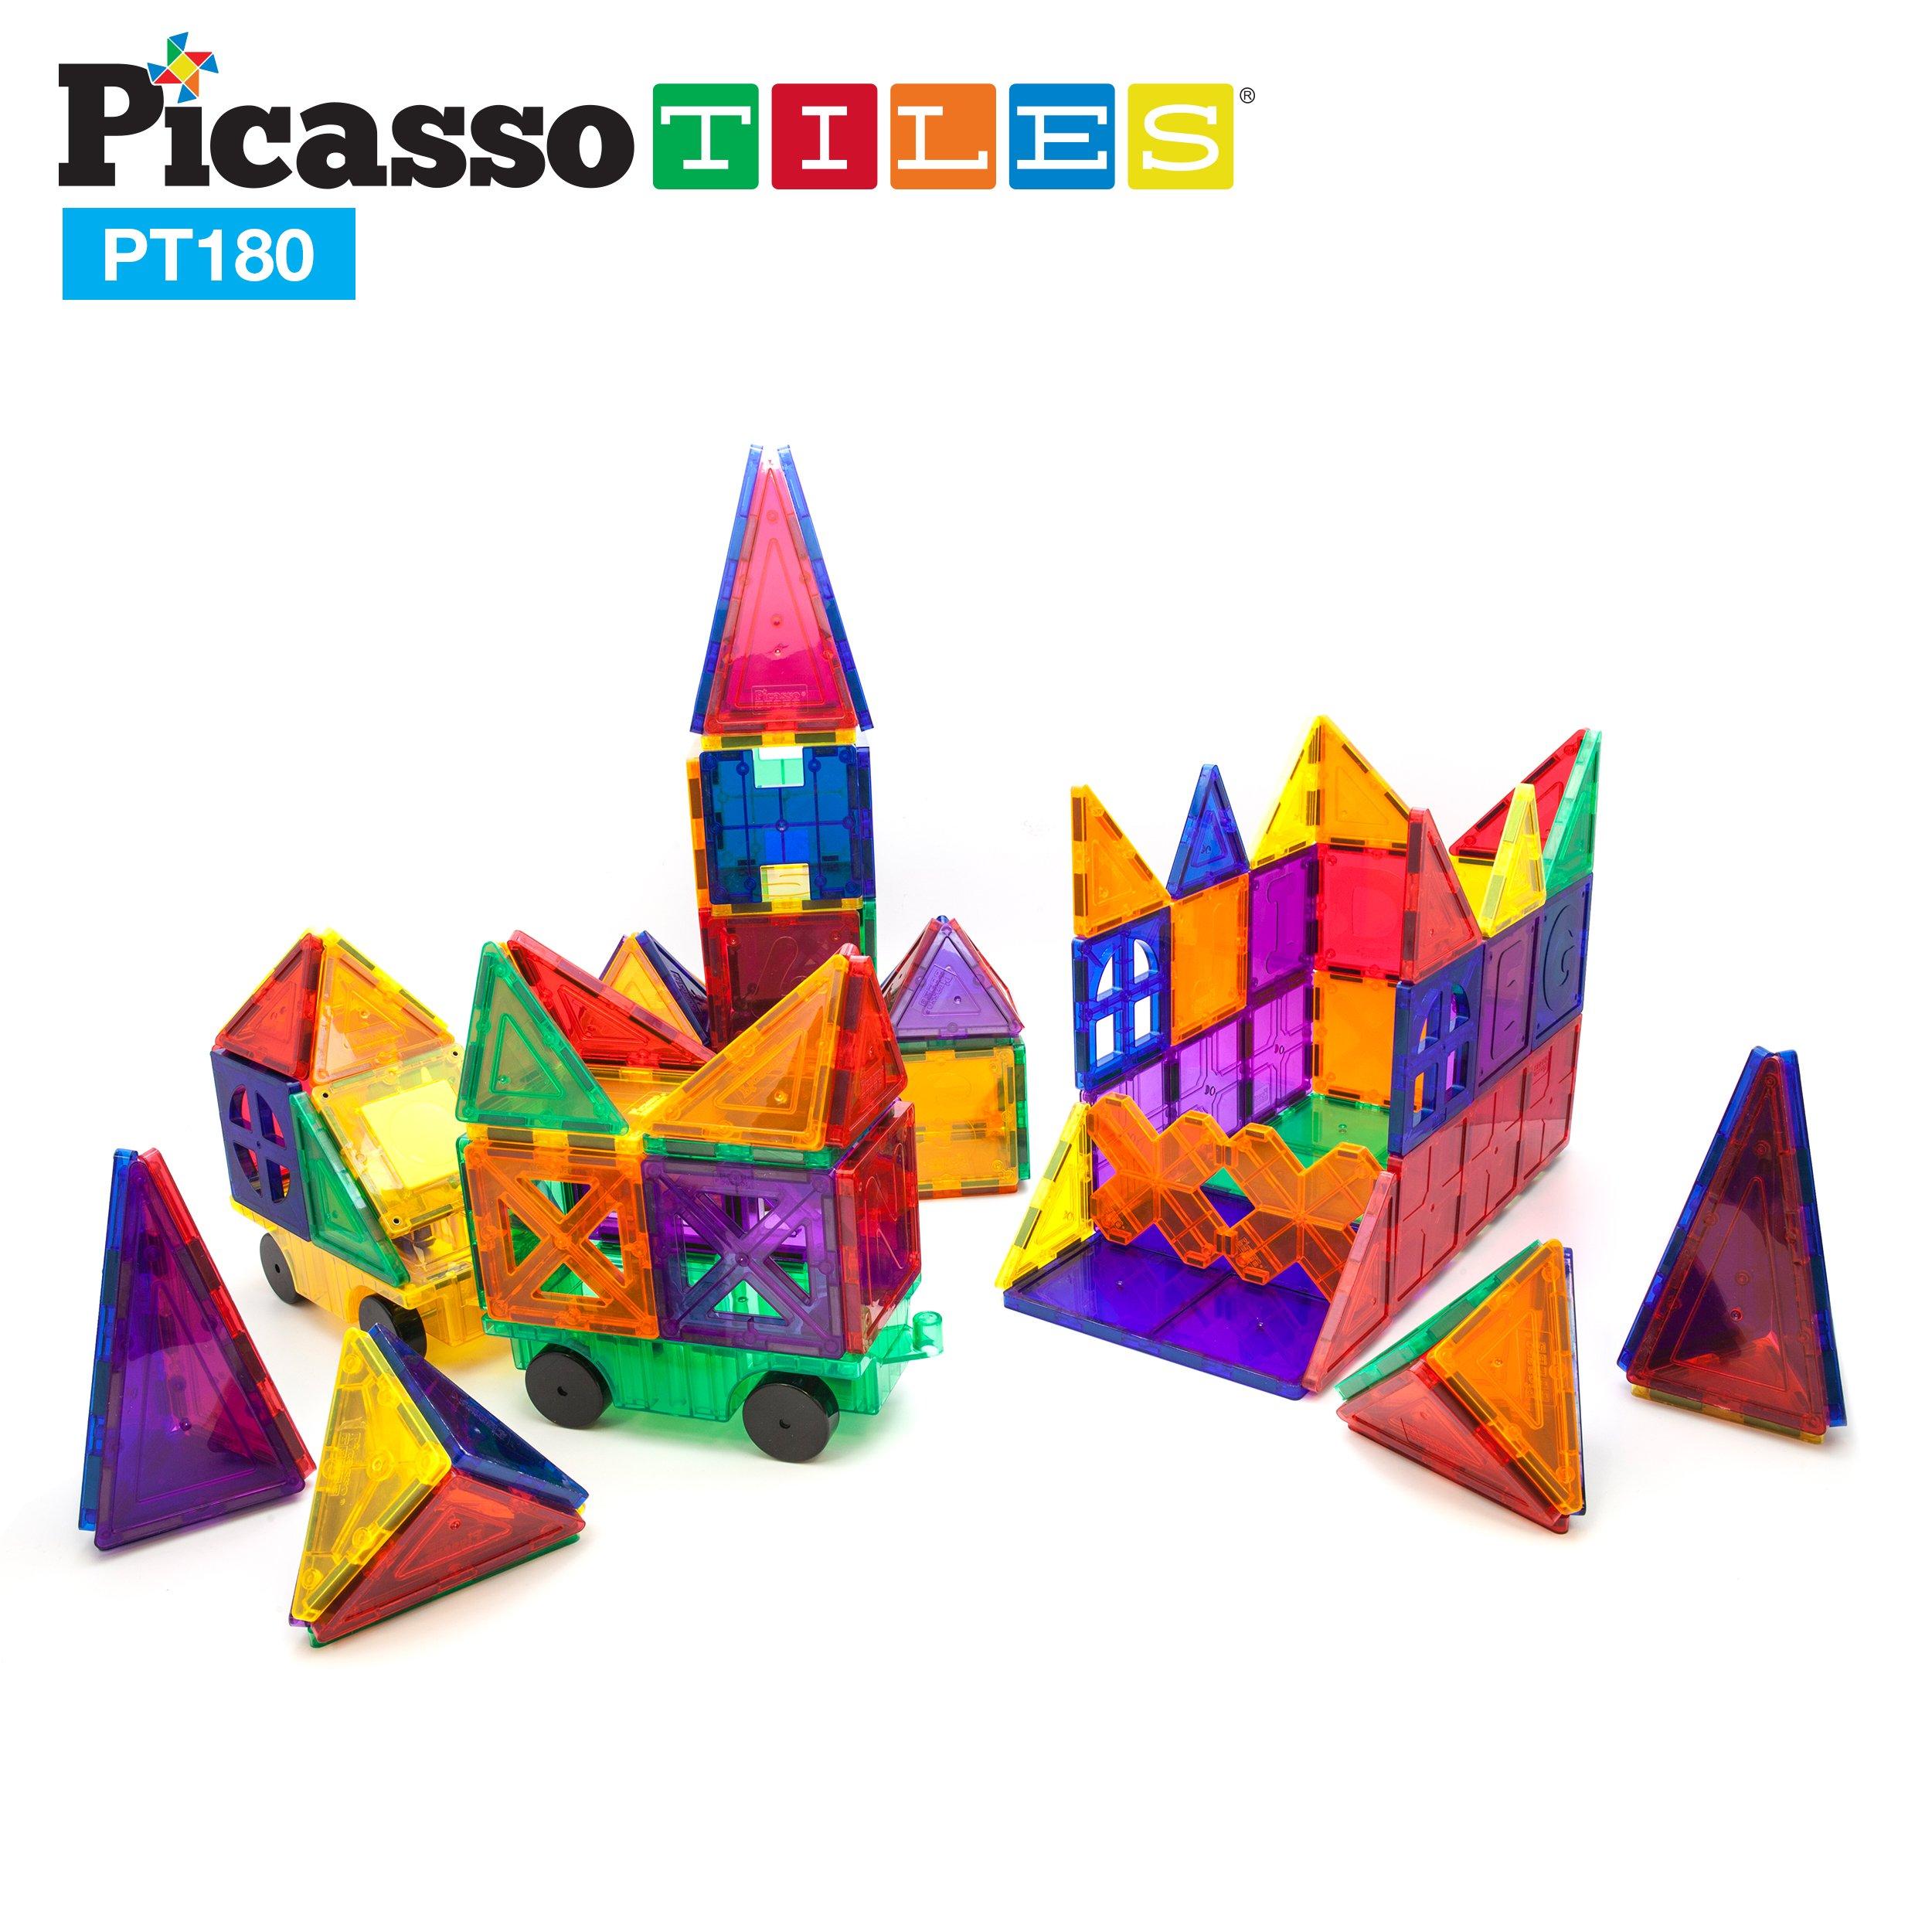 PicassoTiles 180 Piece Set 180pc Building Block Toy Deluxe Construction Kit Magnet Building Tiles Clear Color Magnetic 3D Construction Playboards Educational Blocks Creativity Beyond Imagination